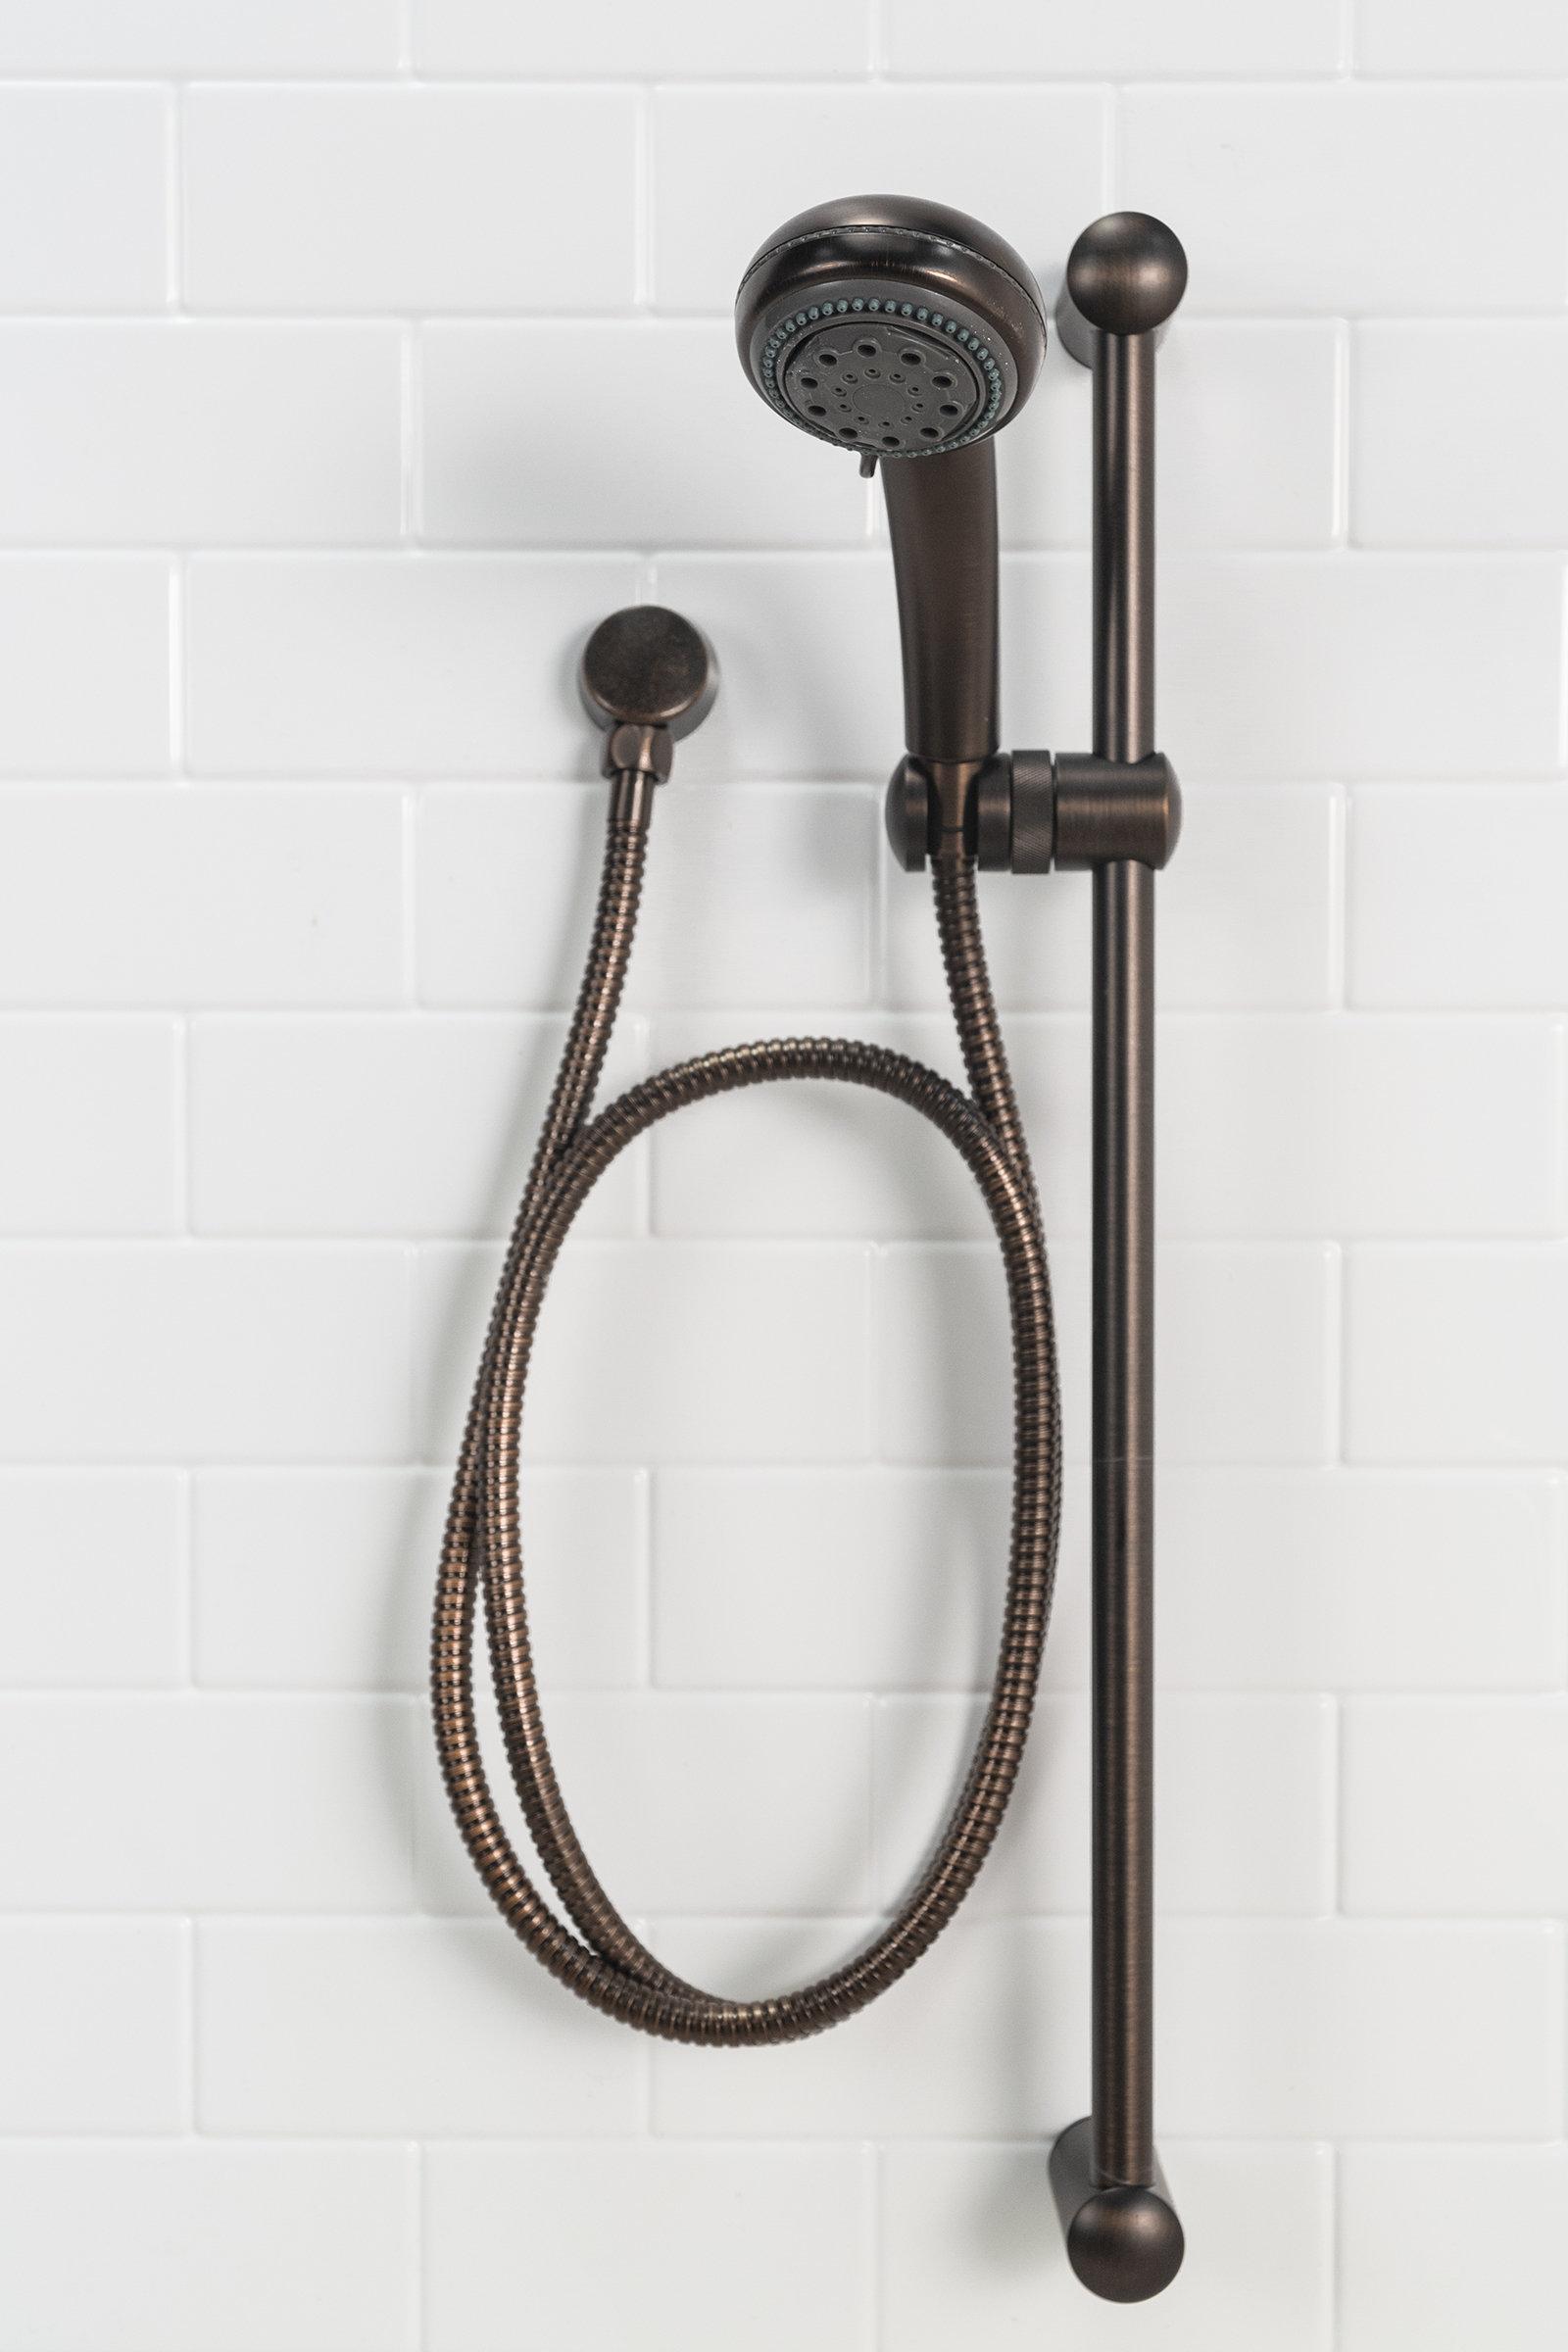 Hand-Held Shower Head Detroit 586-296-1100 | Walk in Tubs – Store ...